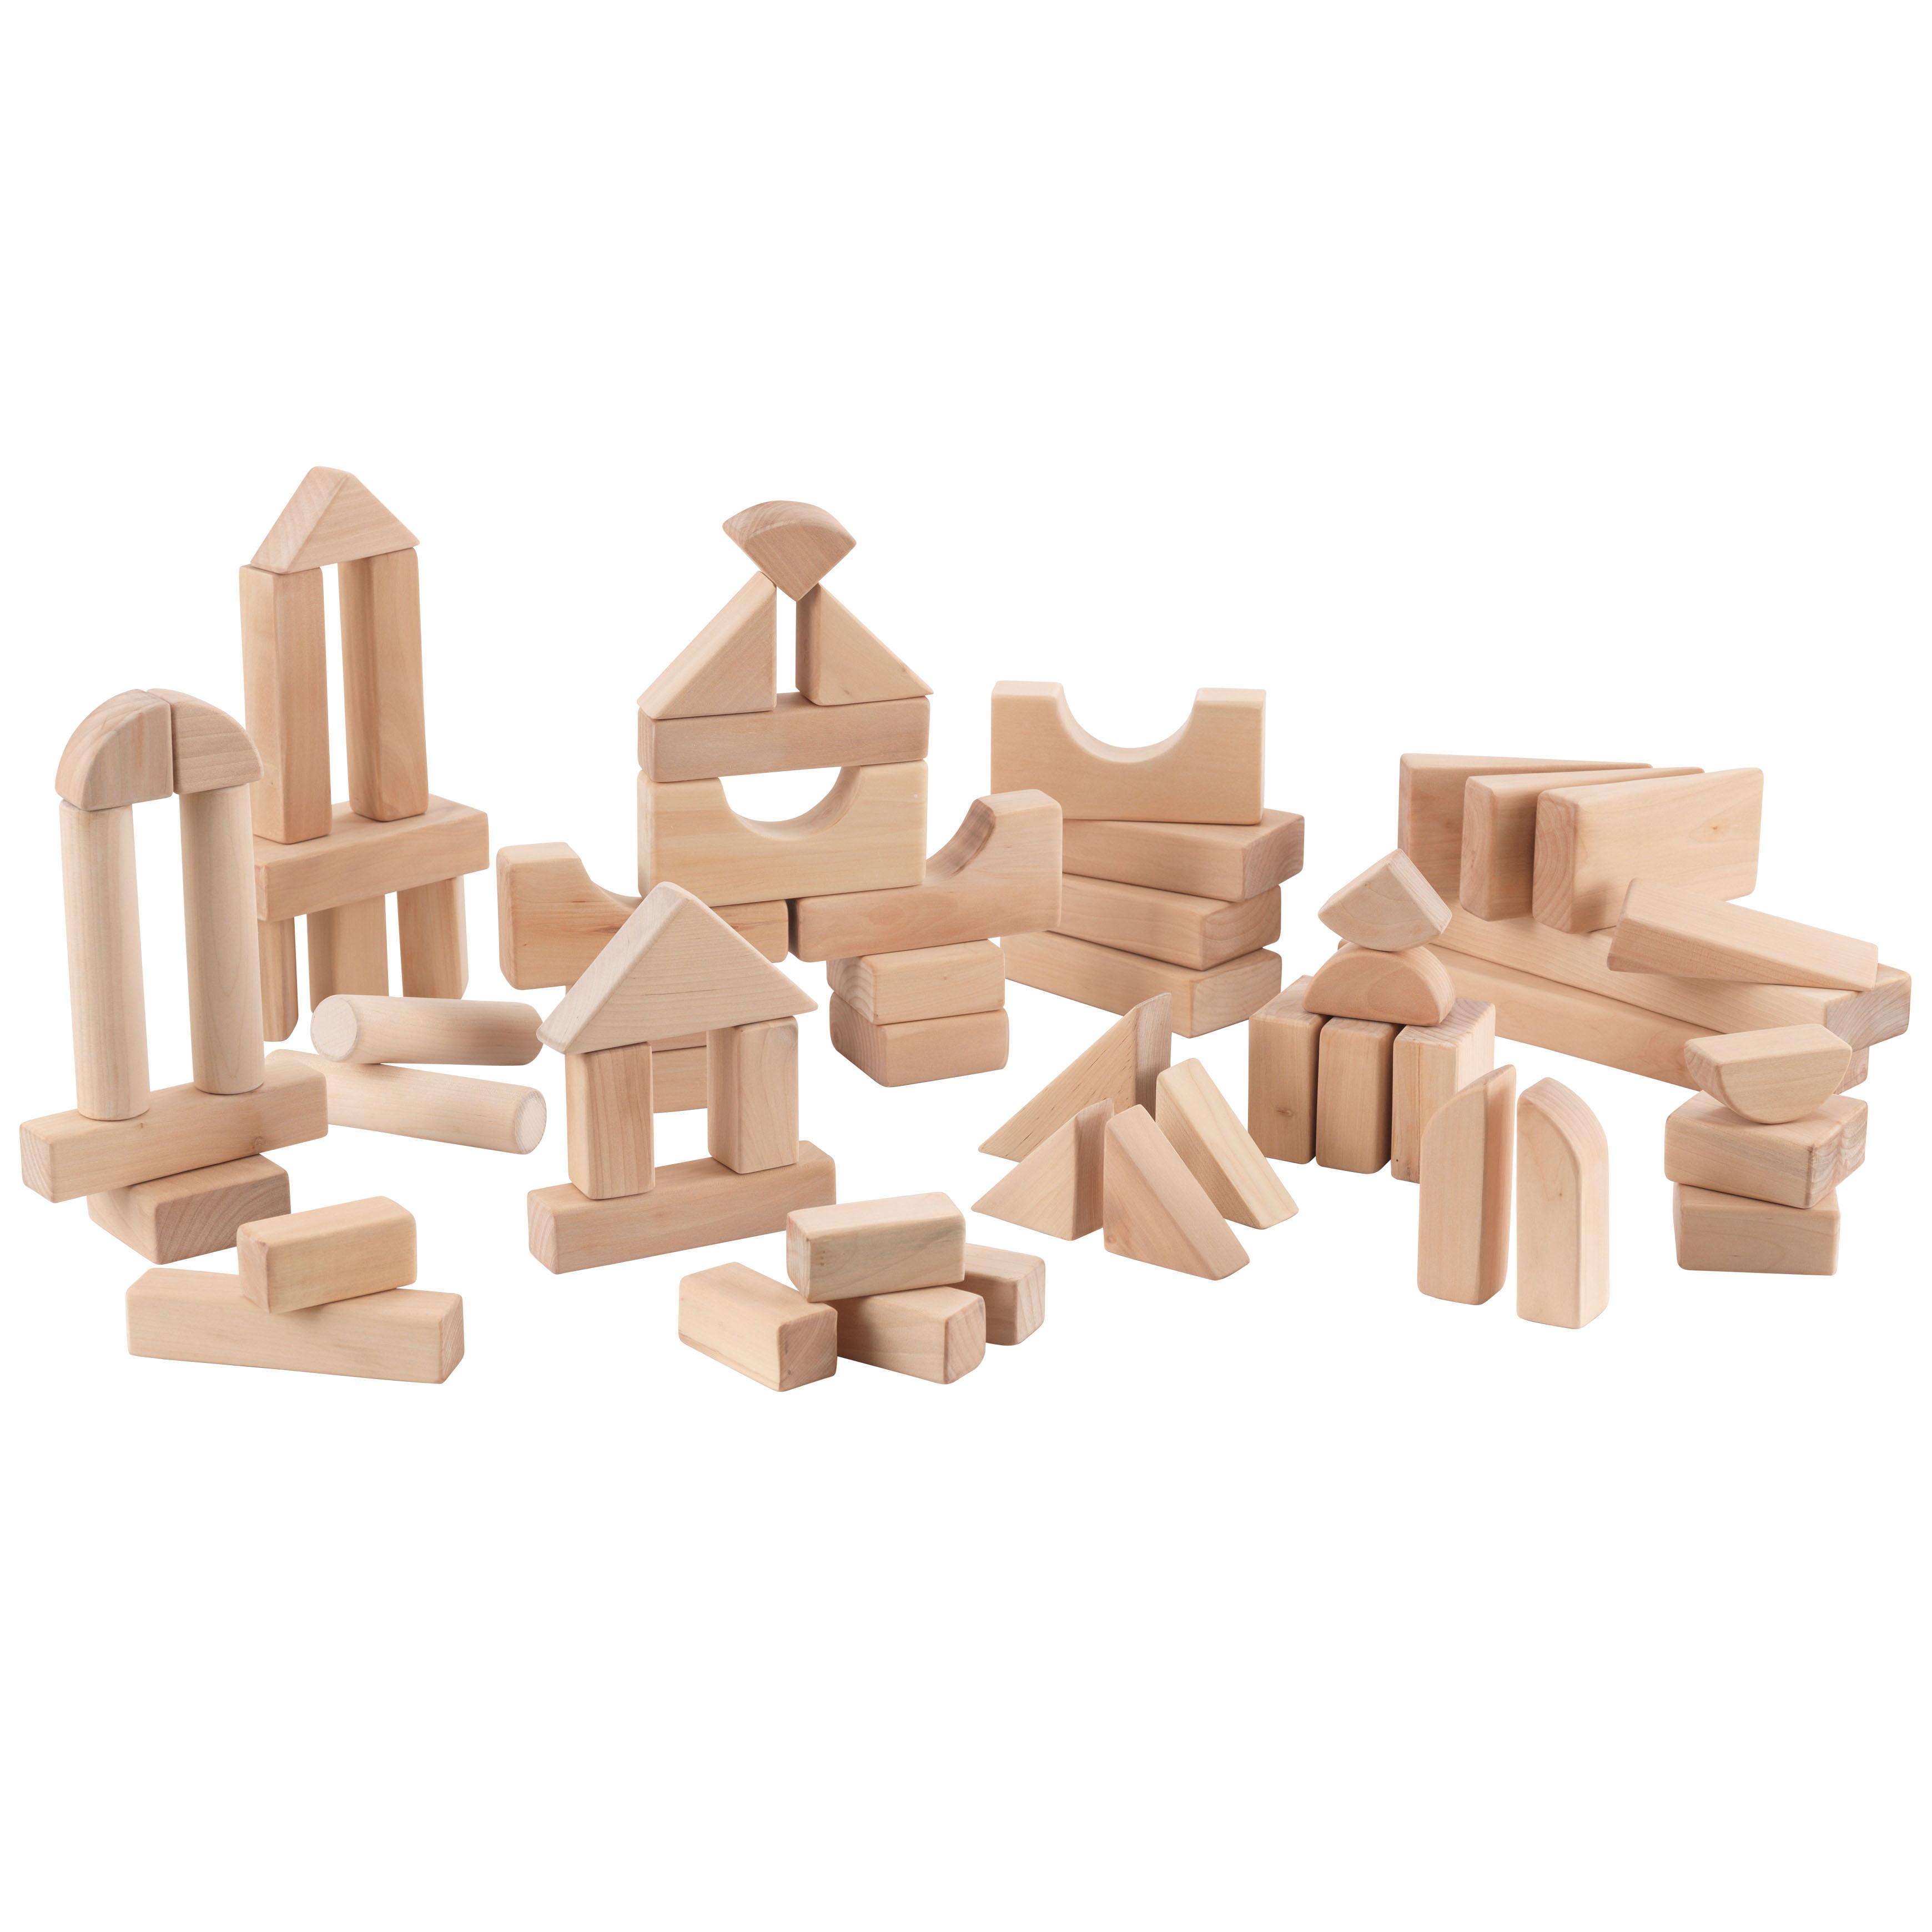 KidKraft 60-Piece Wooden Block Set - Natural